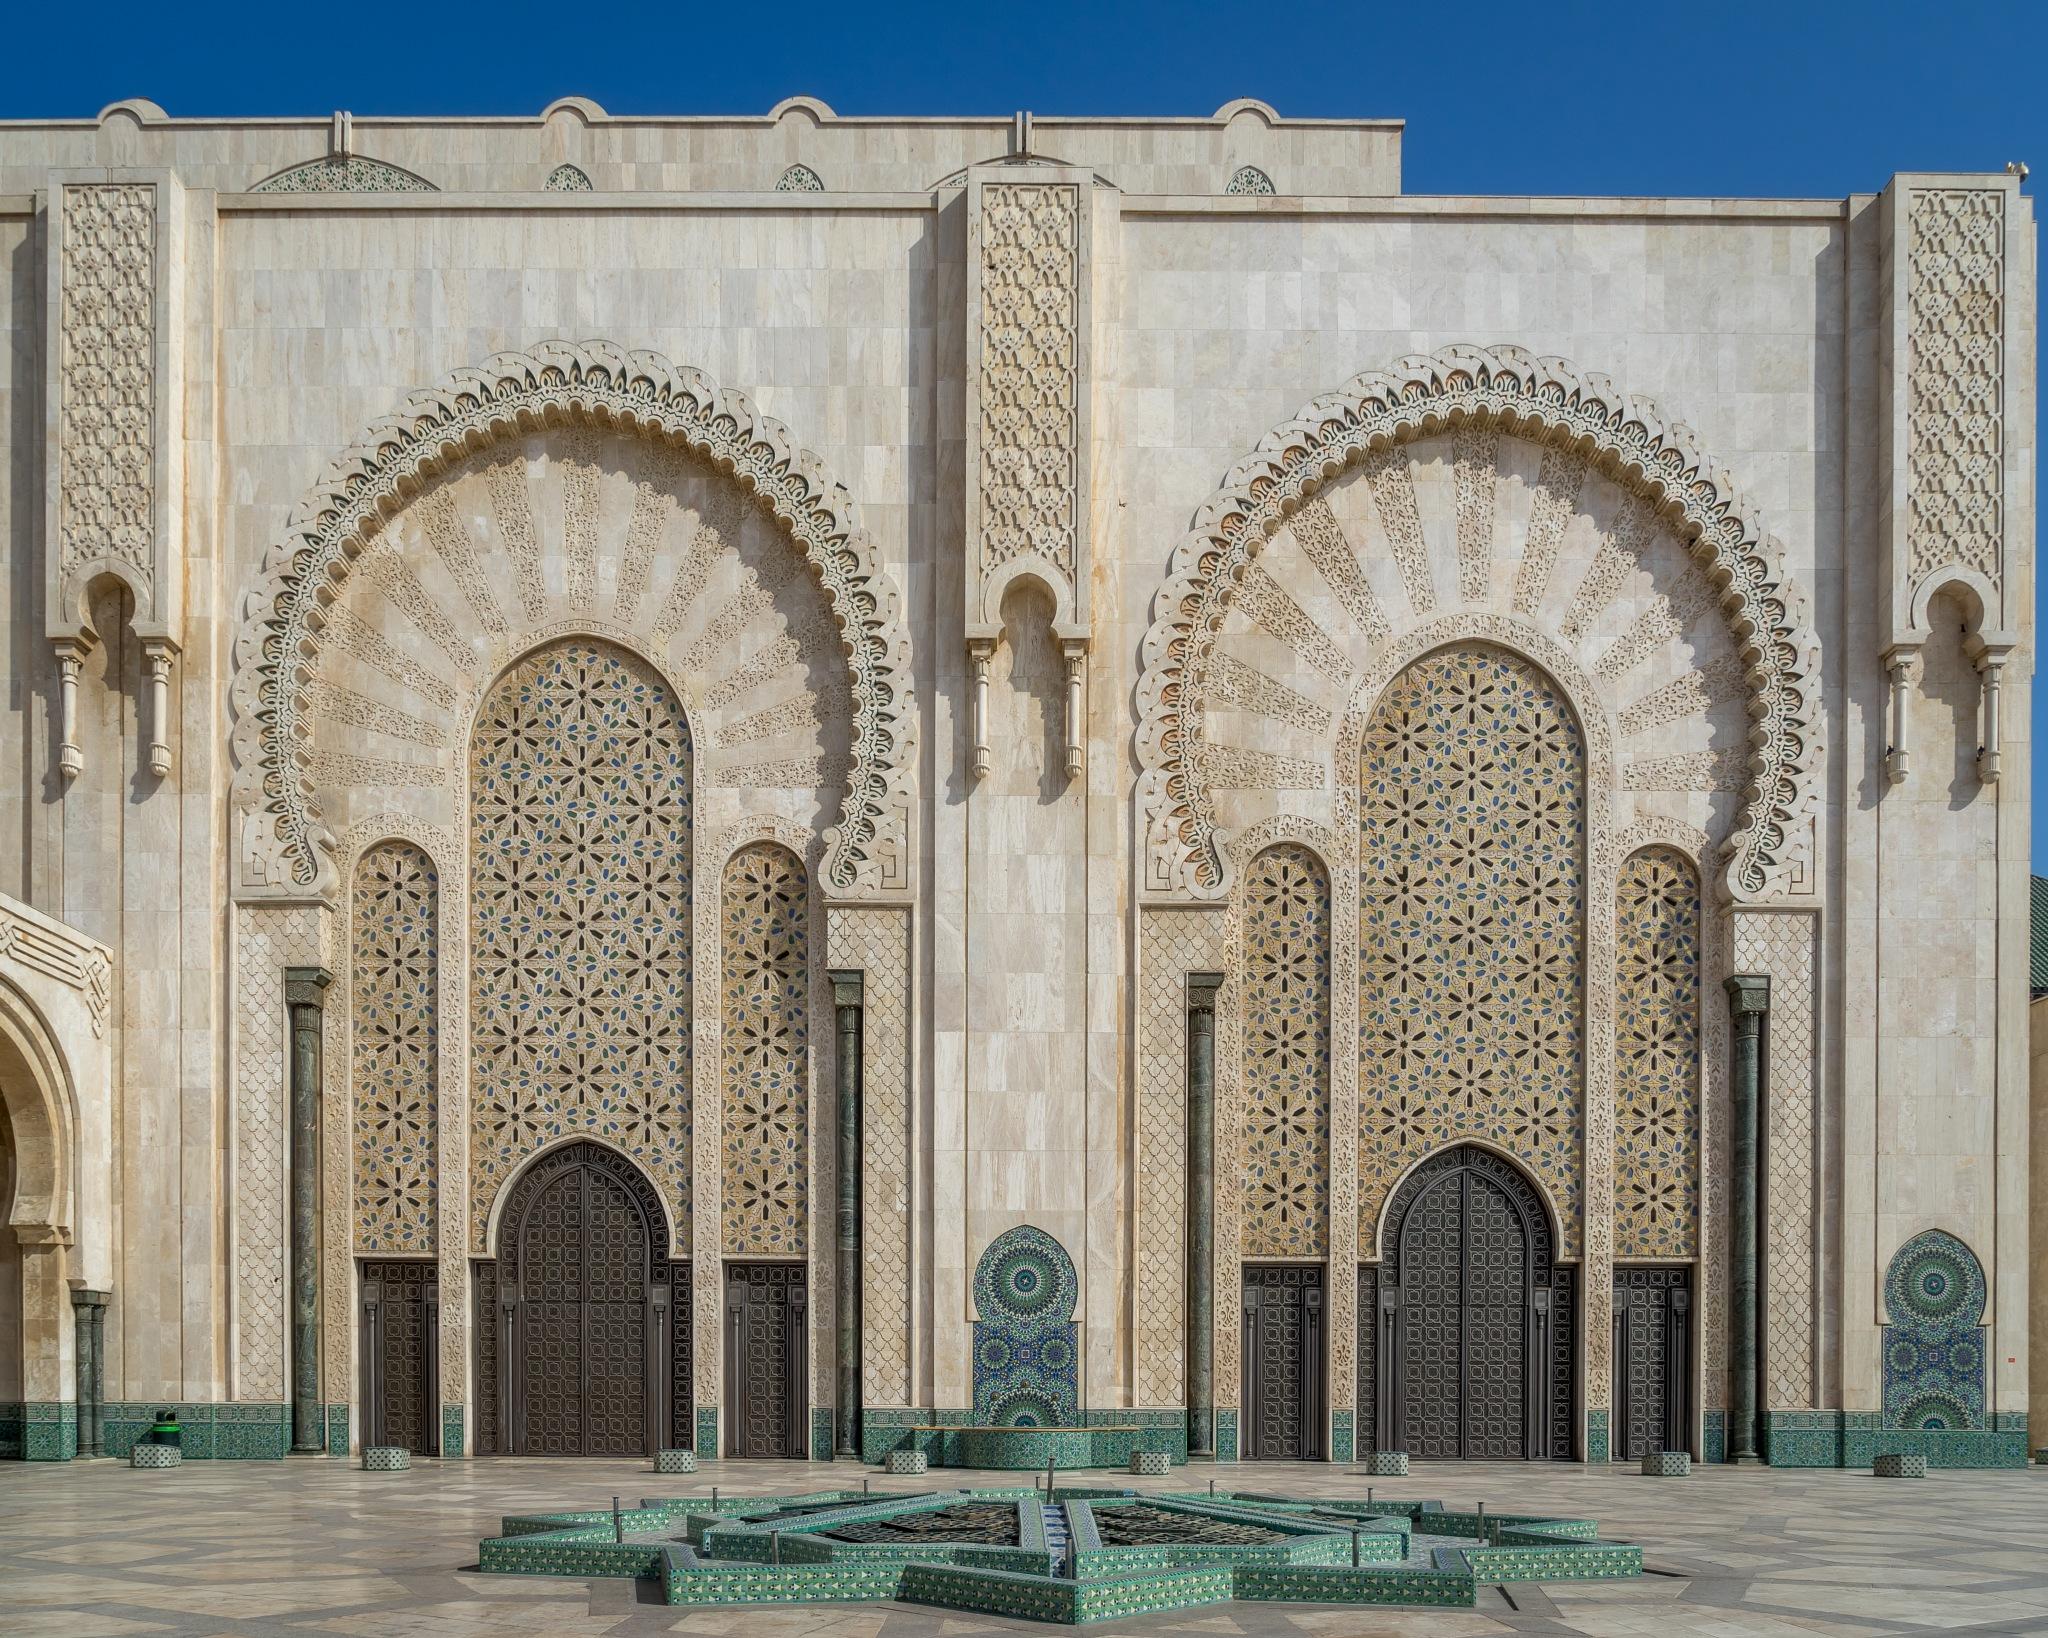 Hassan II-moskee by esmeralda.holman